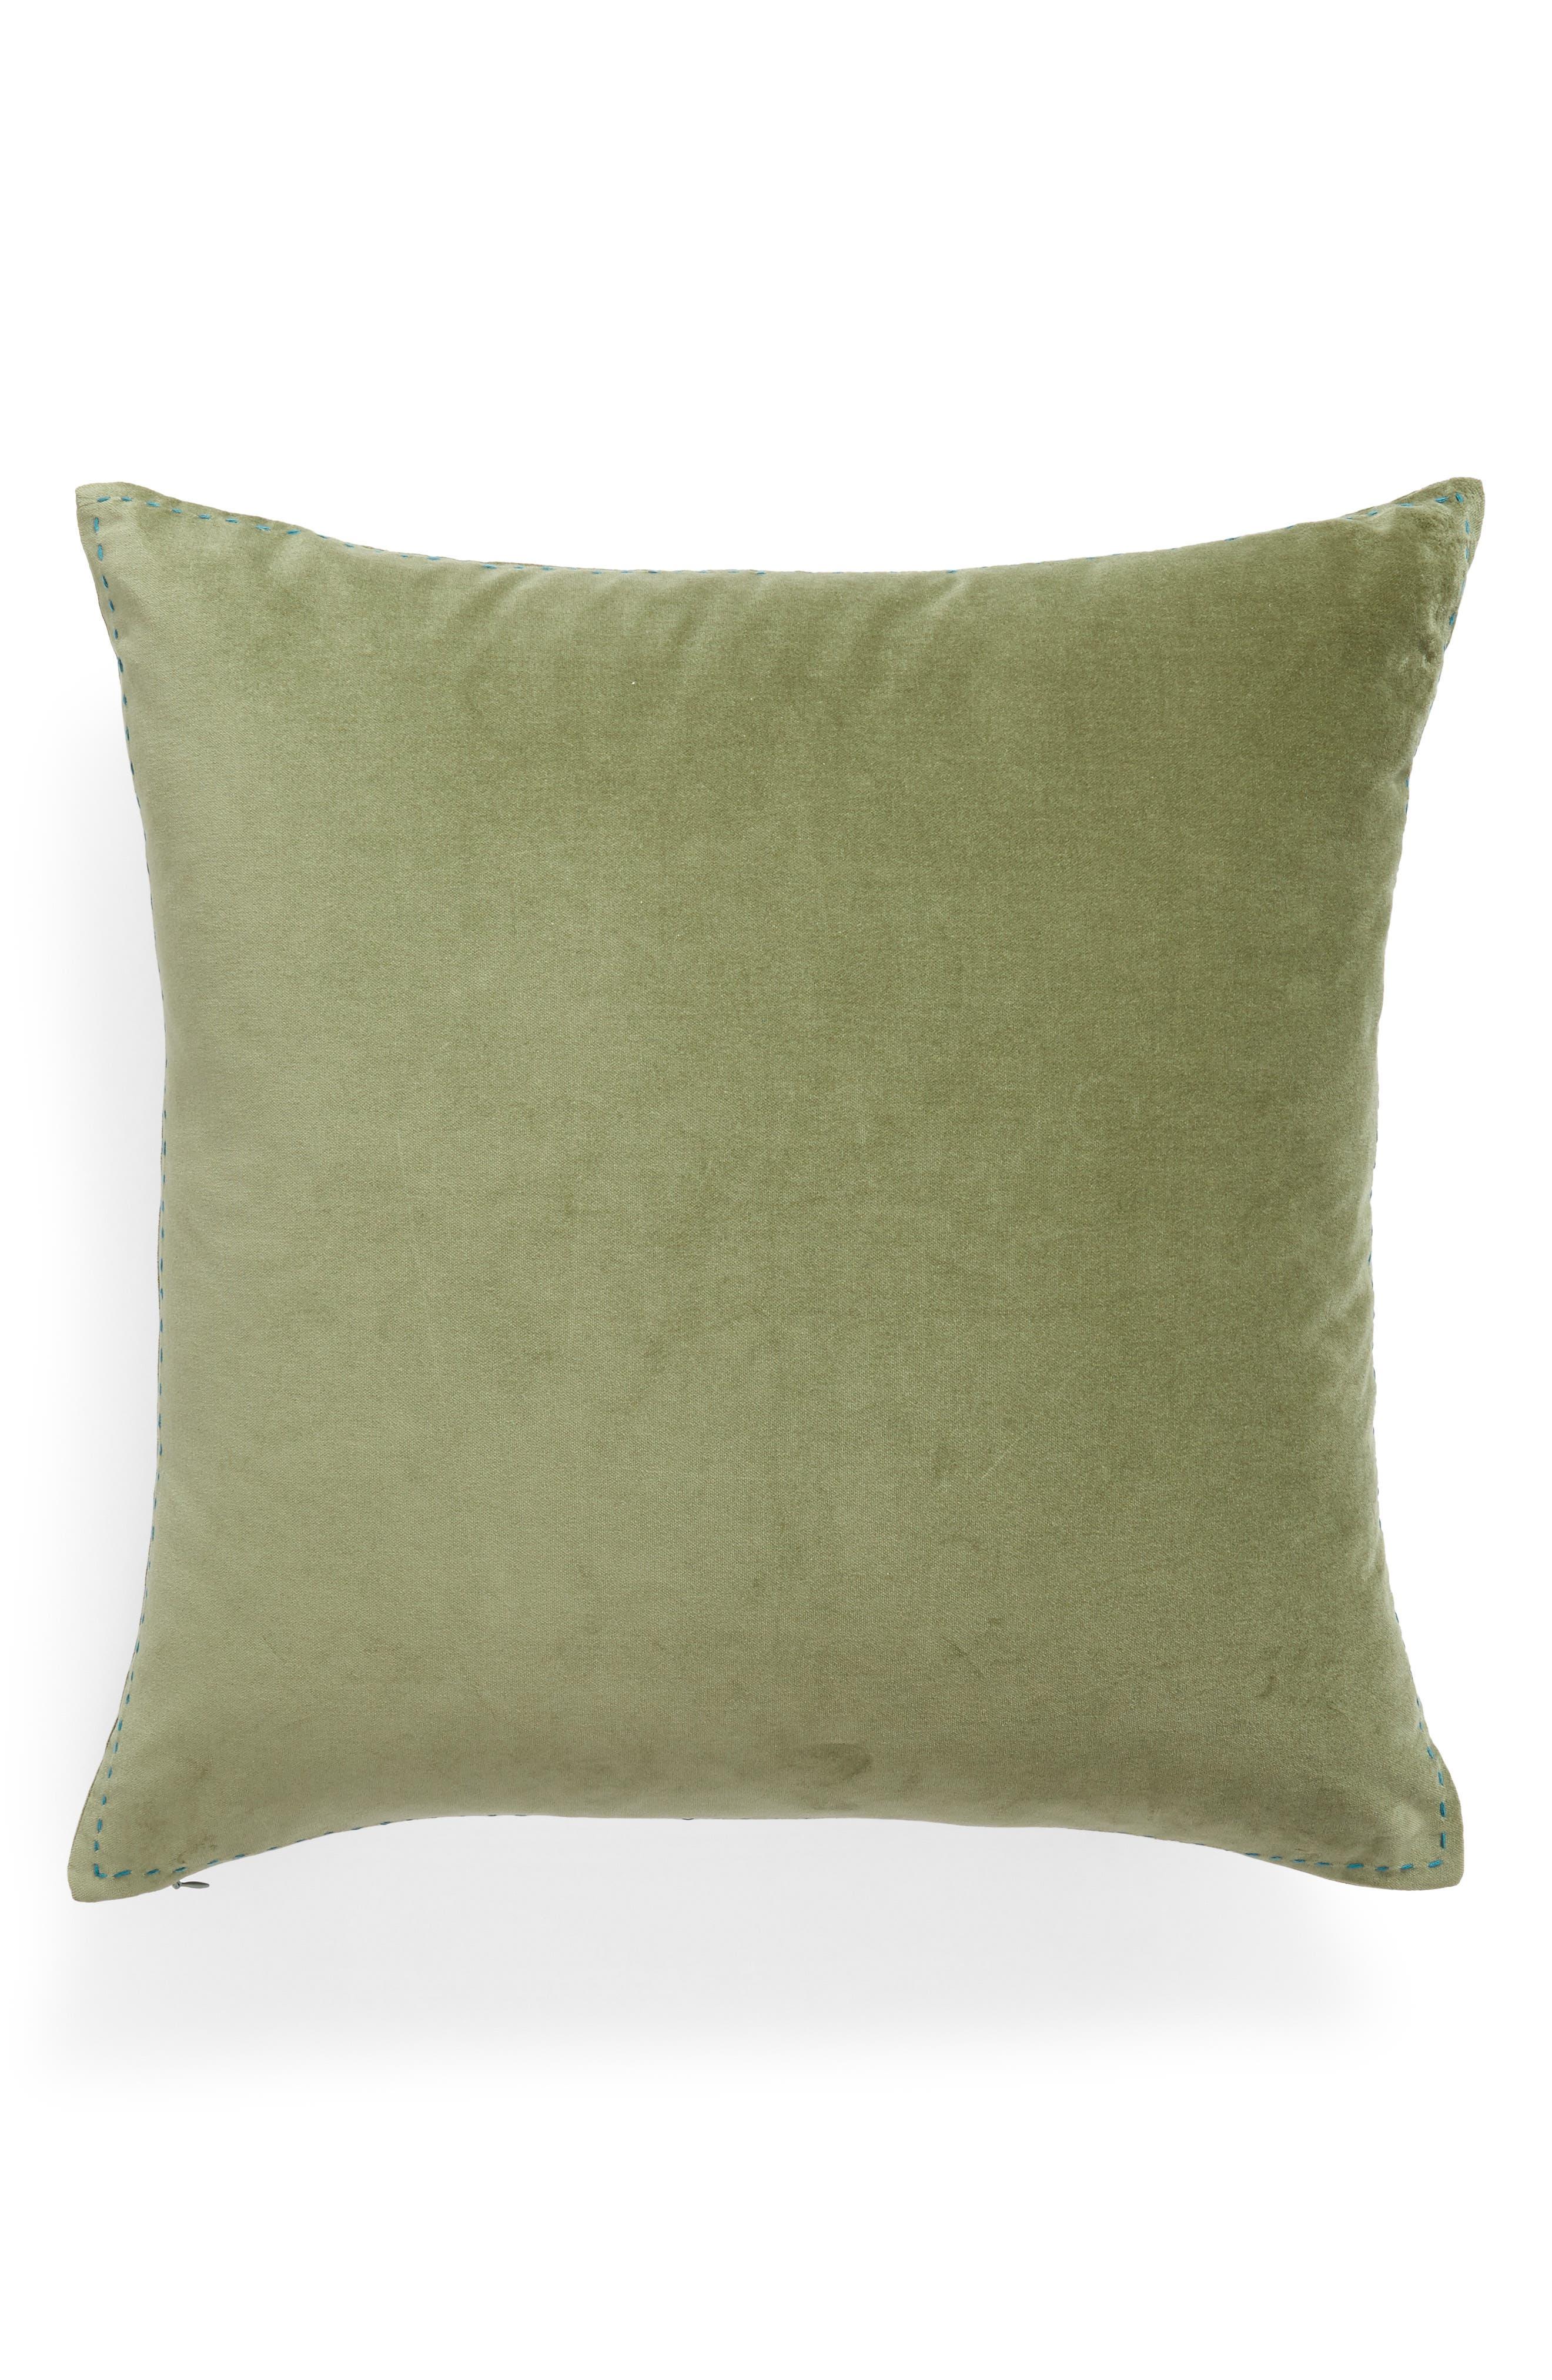 Ticking Border Accent Pillow,                             Main thumbnail 1, color,                             Green Sorrel